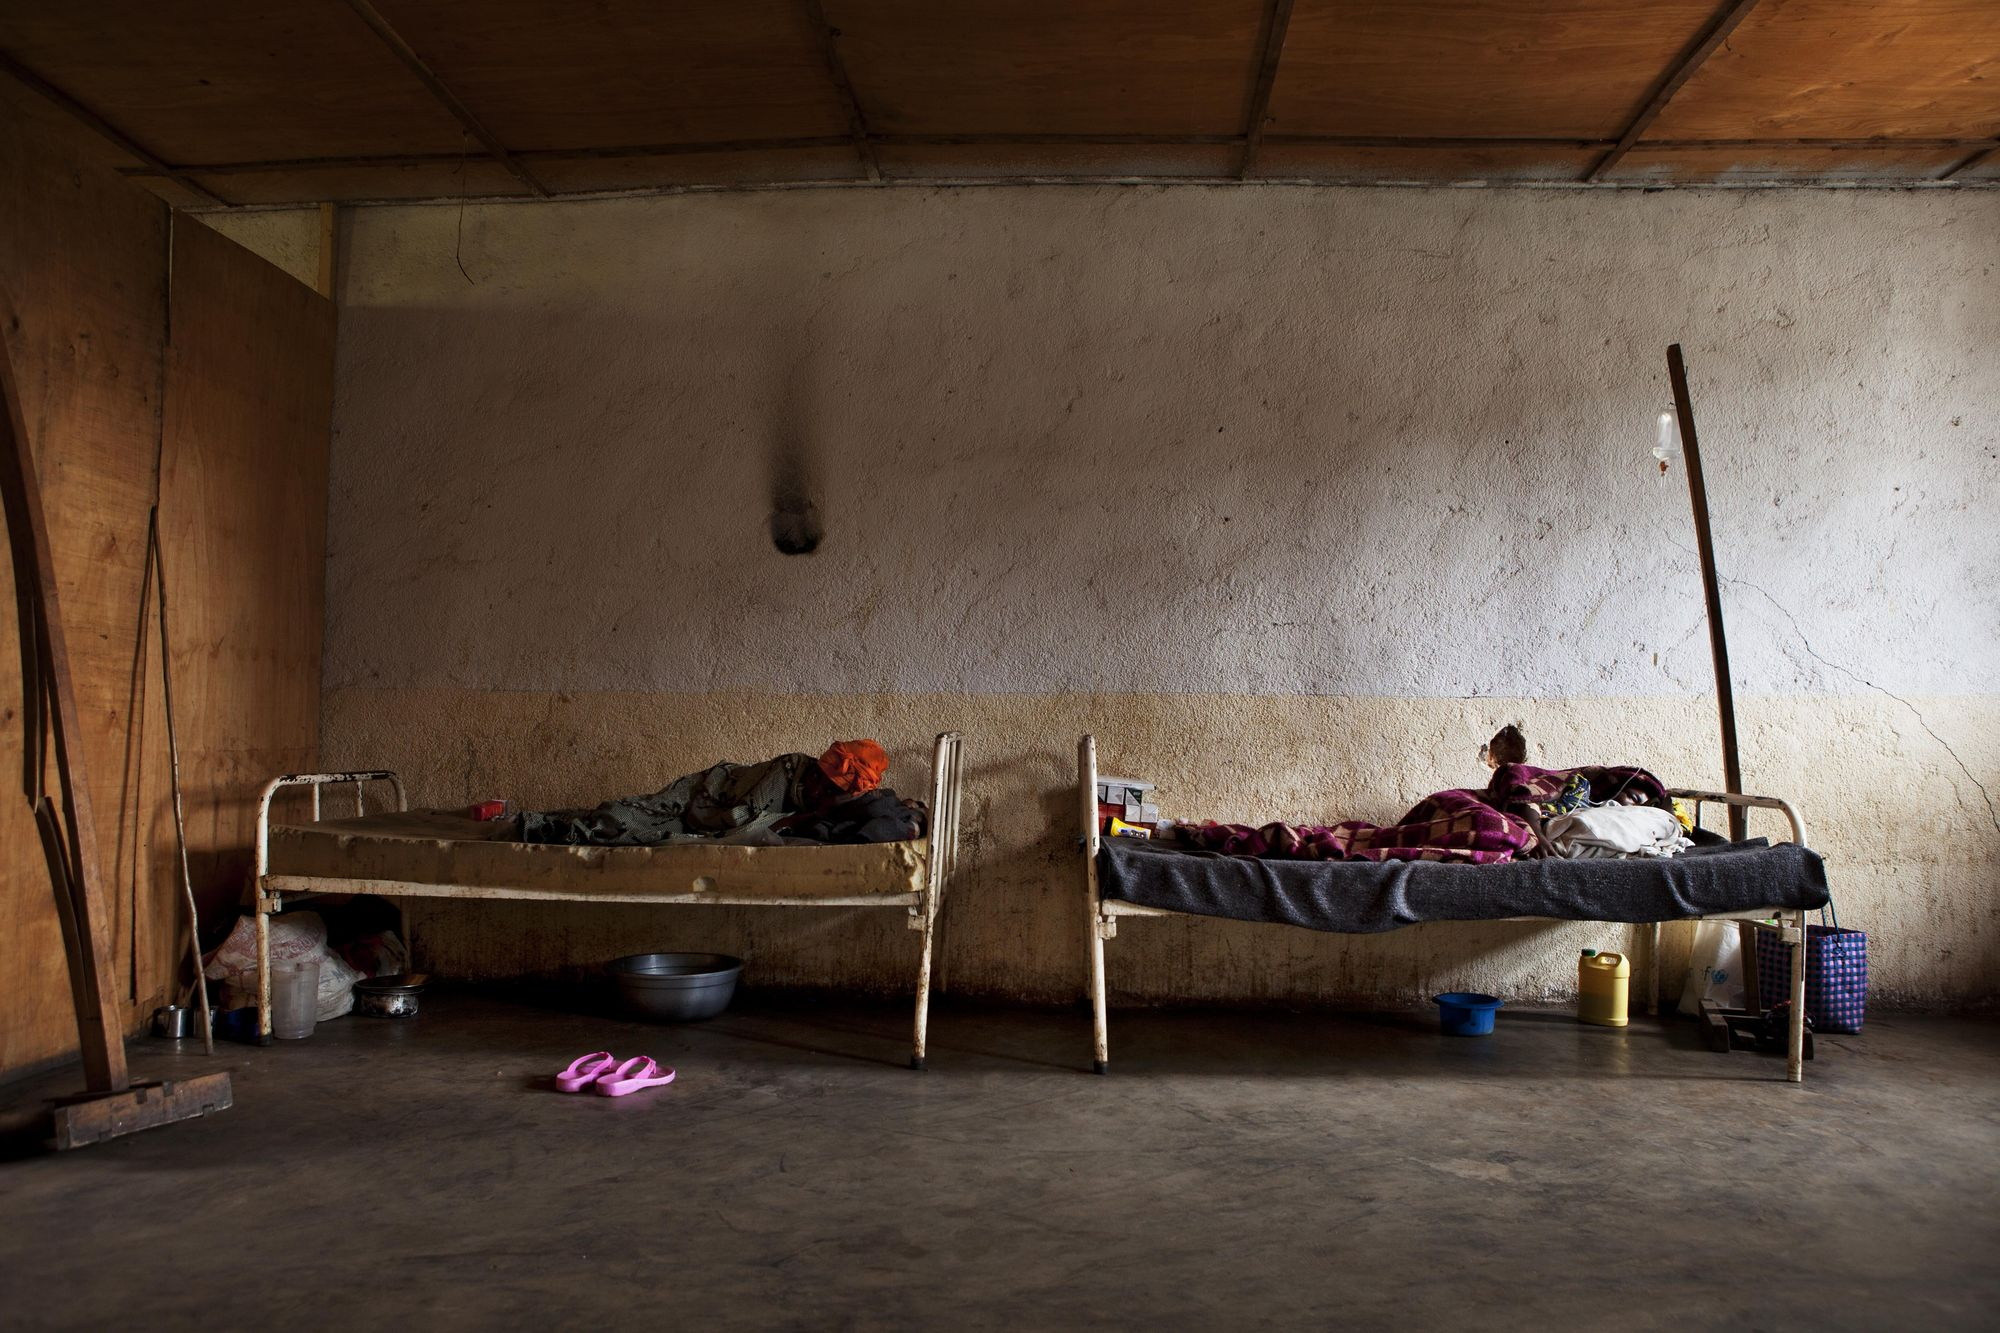 Dos pacientes descansan en el hospital de Matili. Juan Carlos Tomasi.